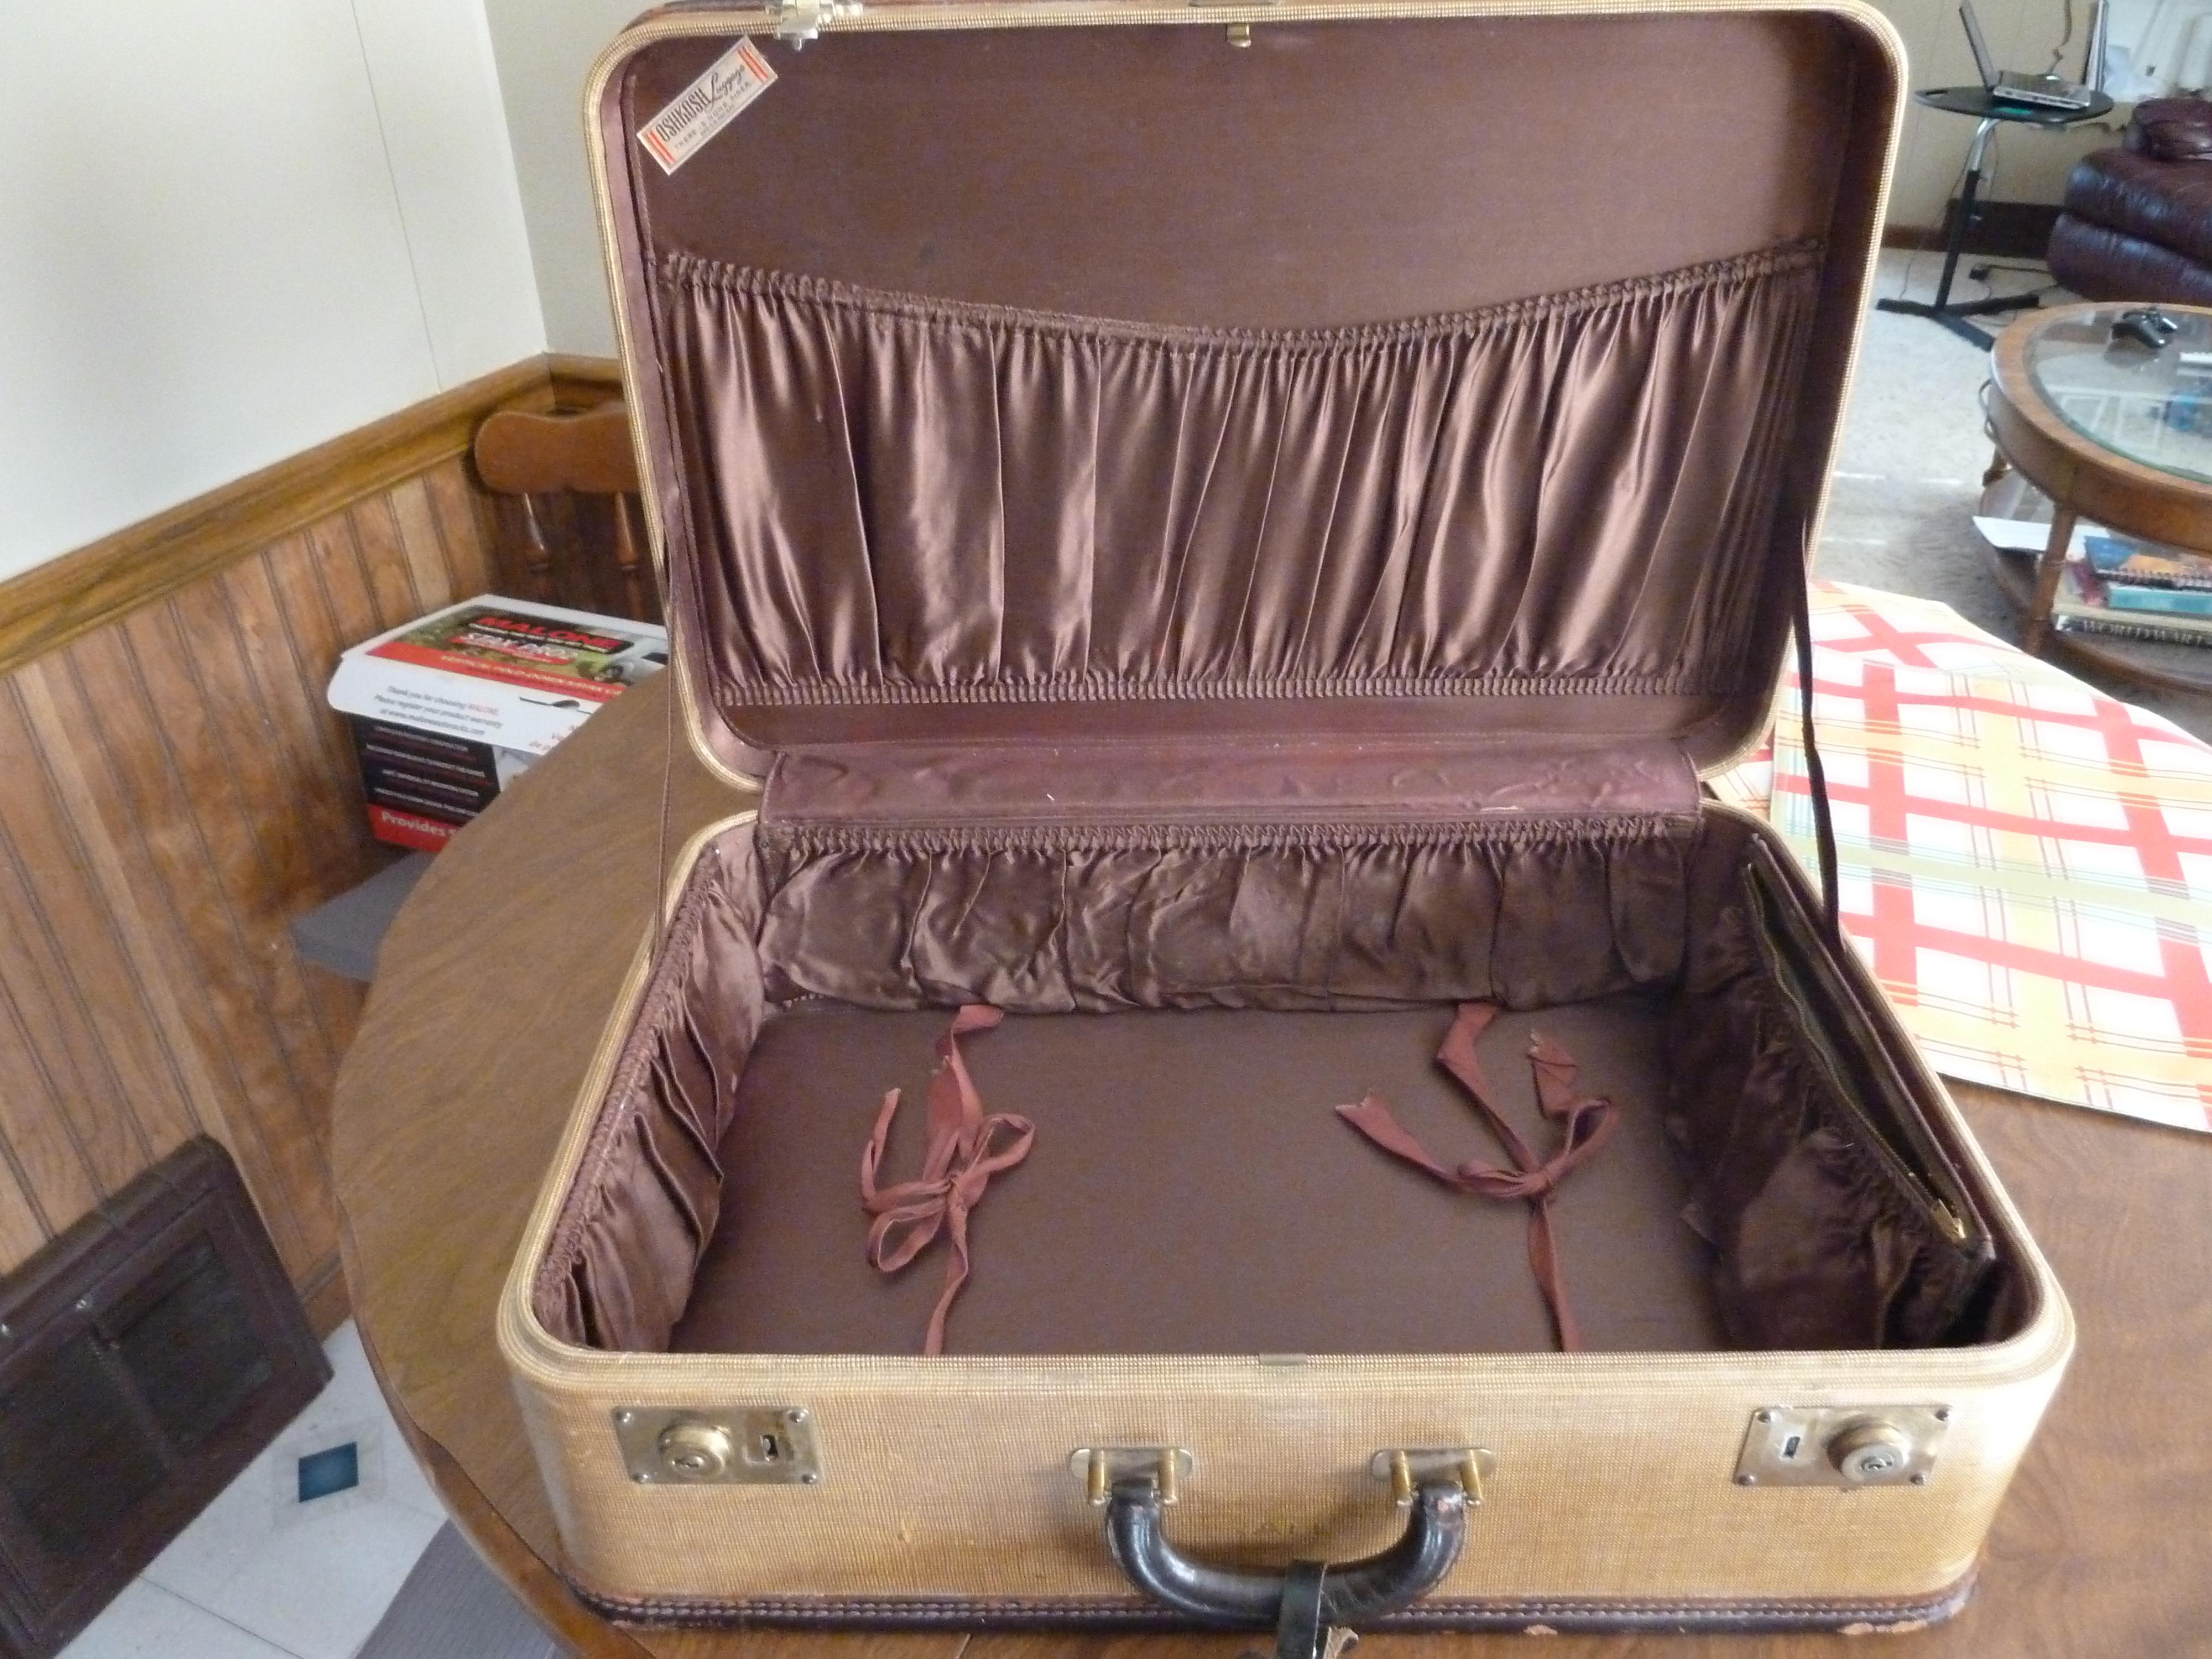 Oshkosh Luggage – Austin M. Frederick